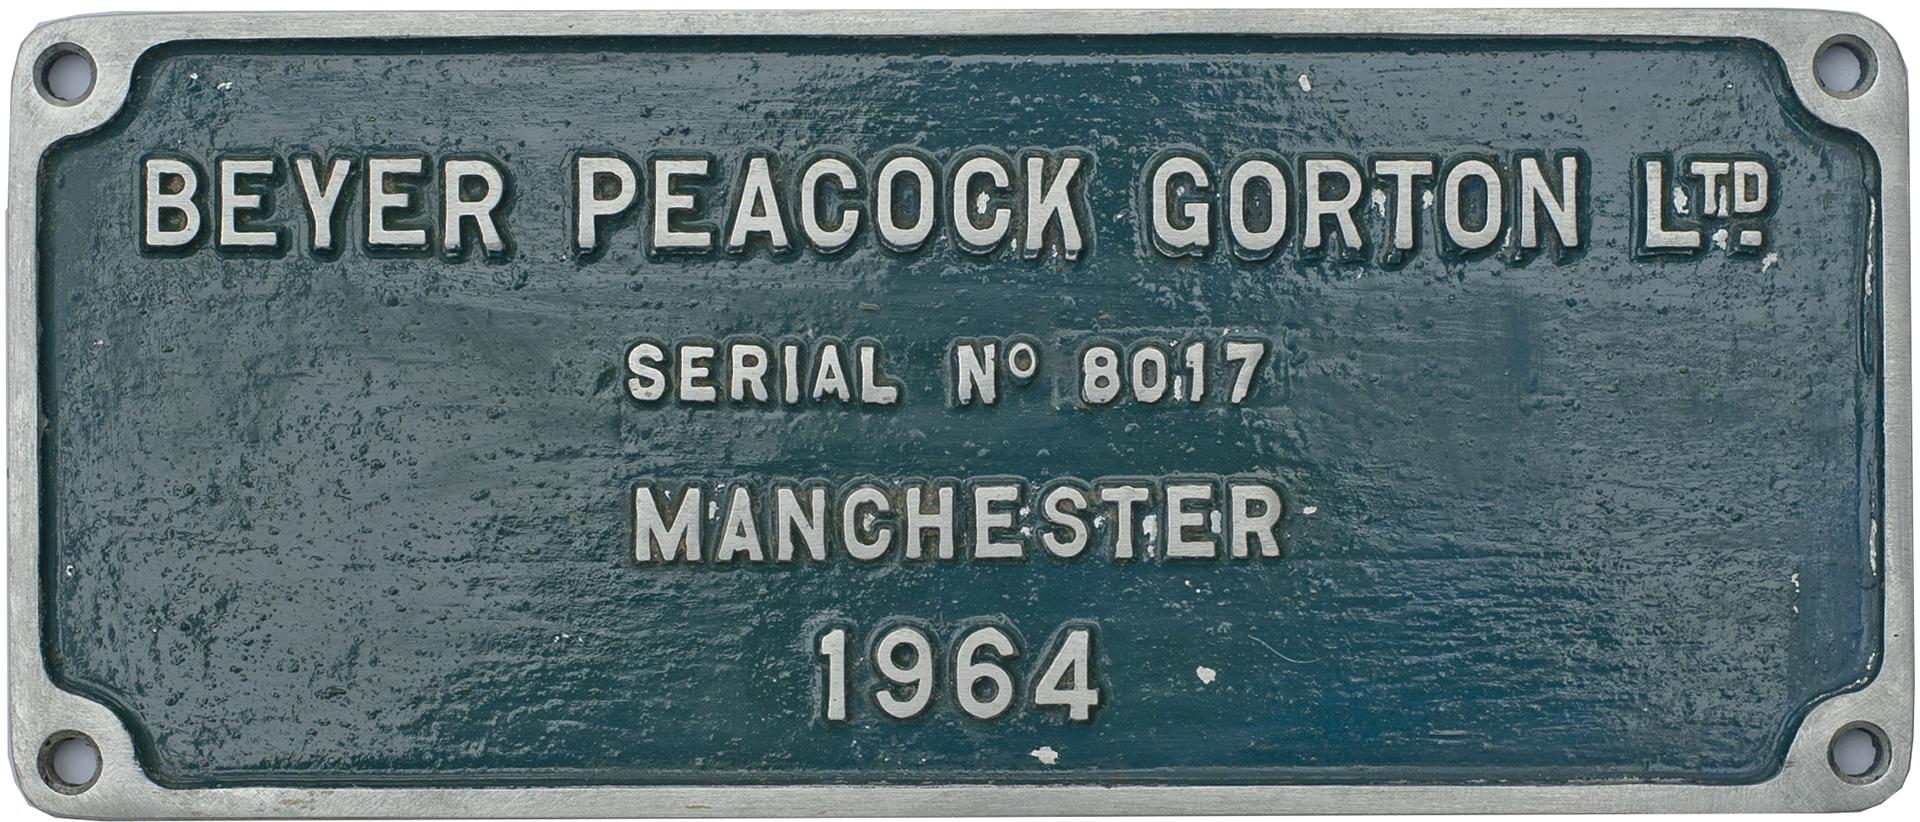 Worksplate BEYER PEACOCK GORTON LTD MANCHESTER